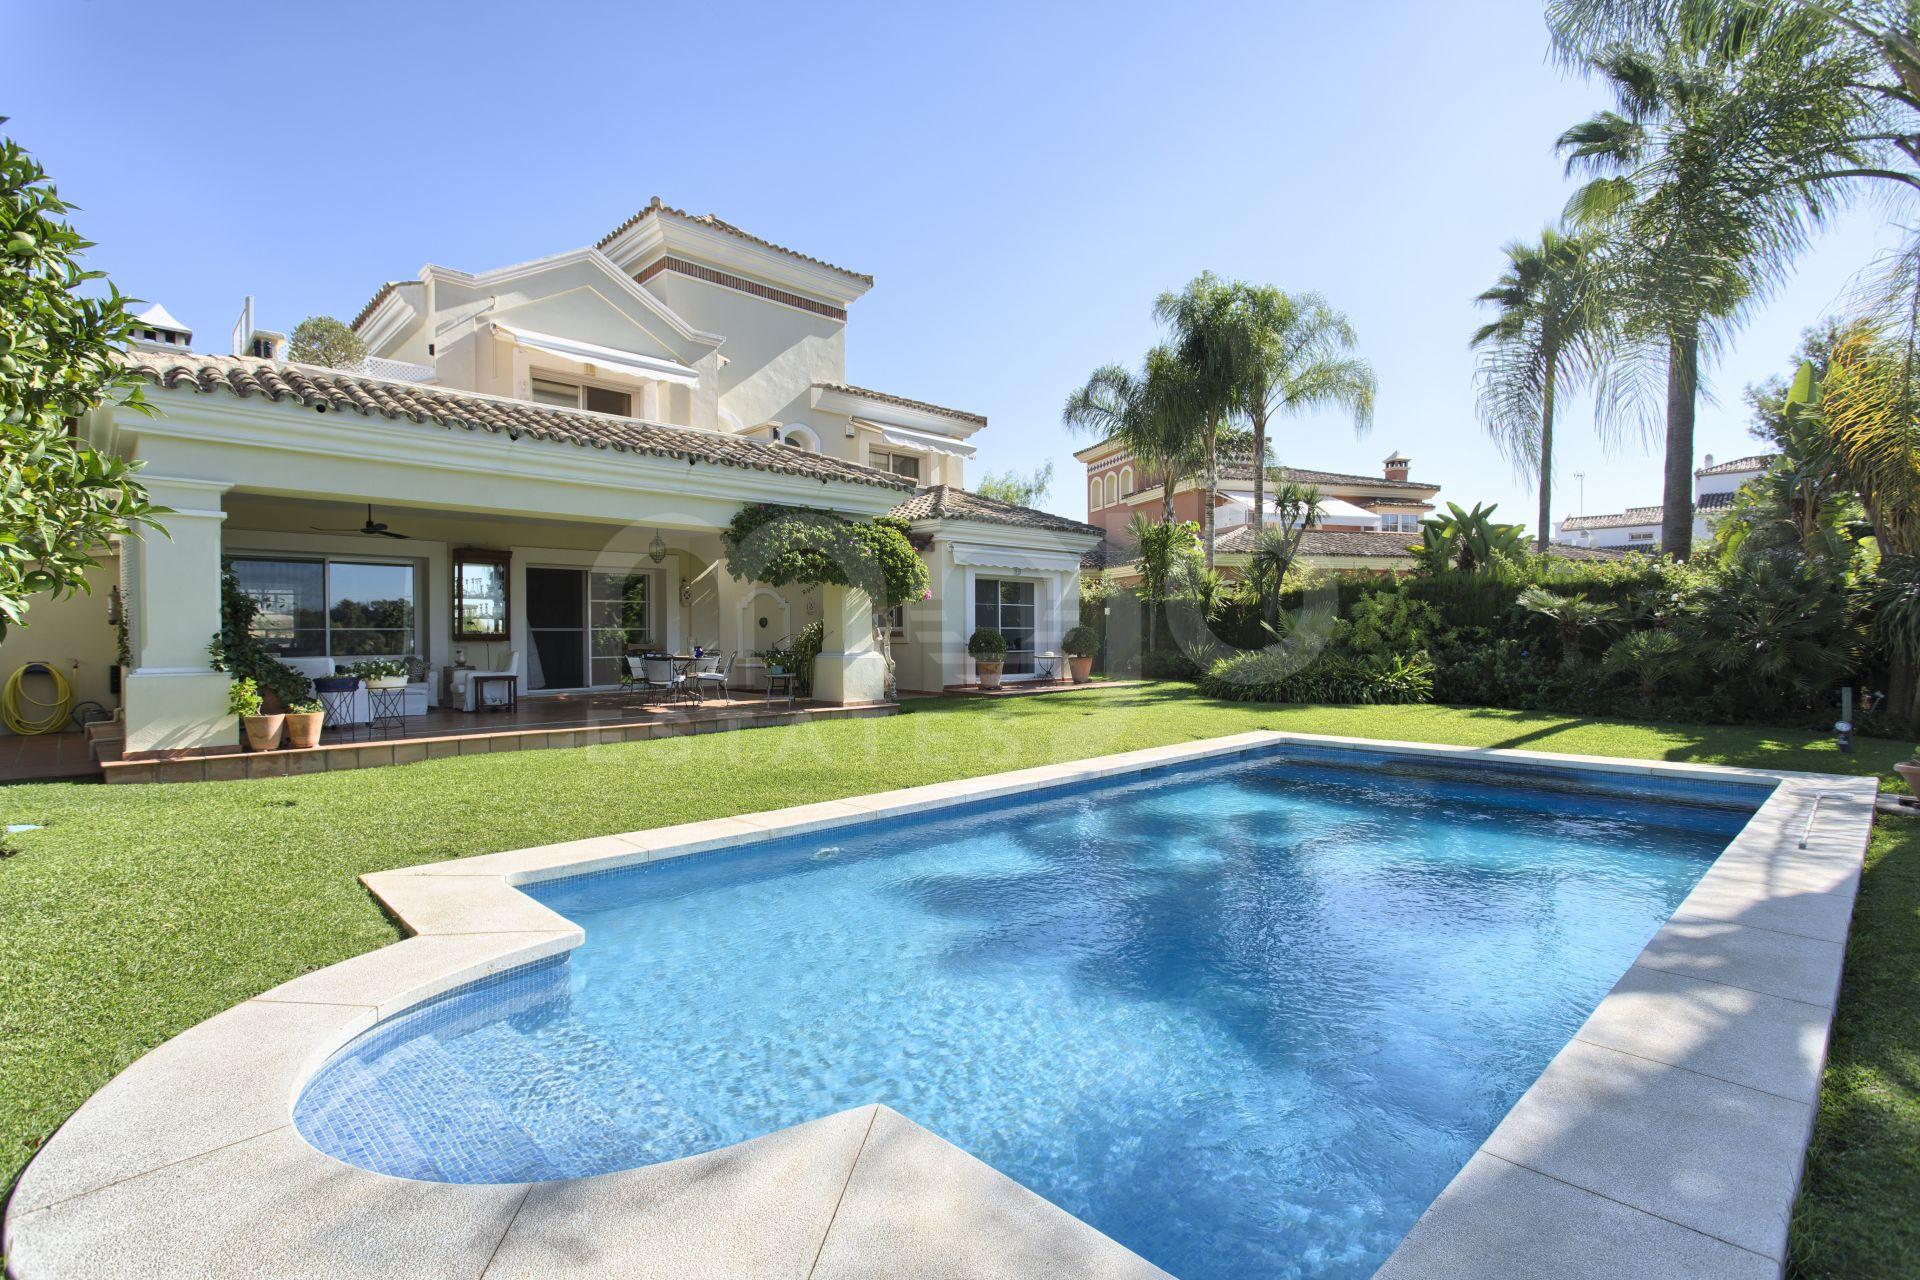 Villa til salg i La Quinta, Benahavis